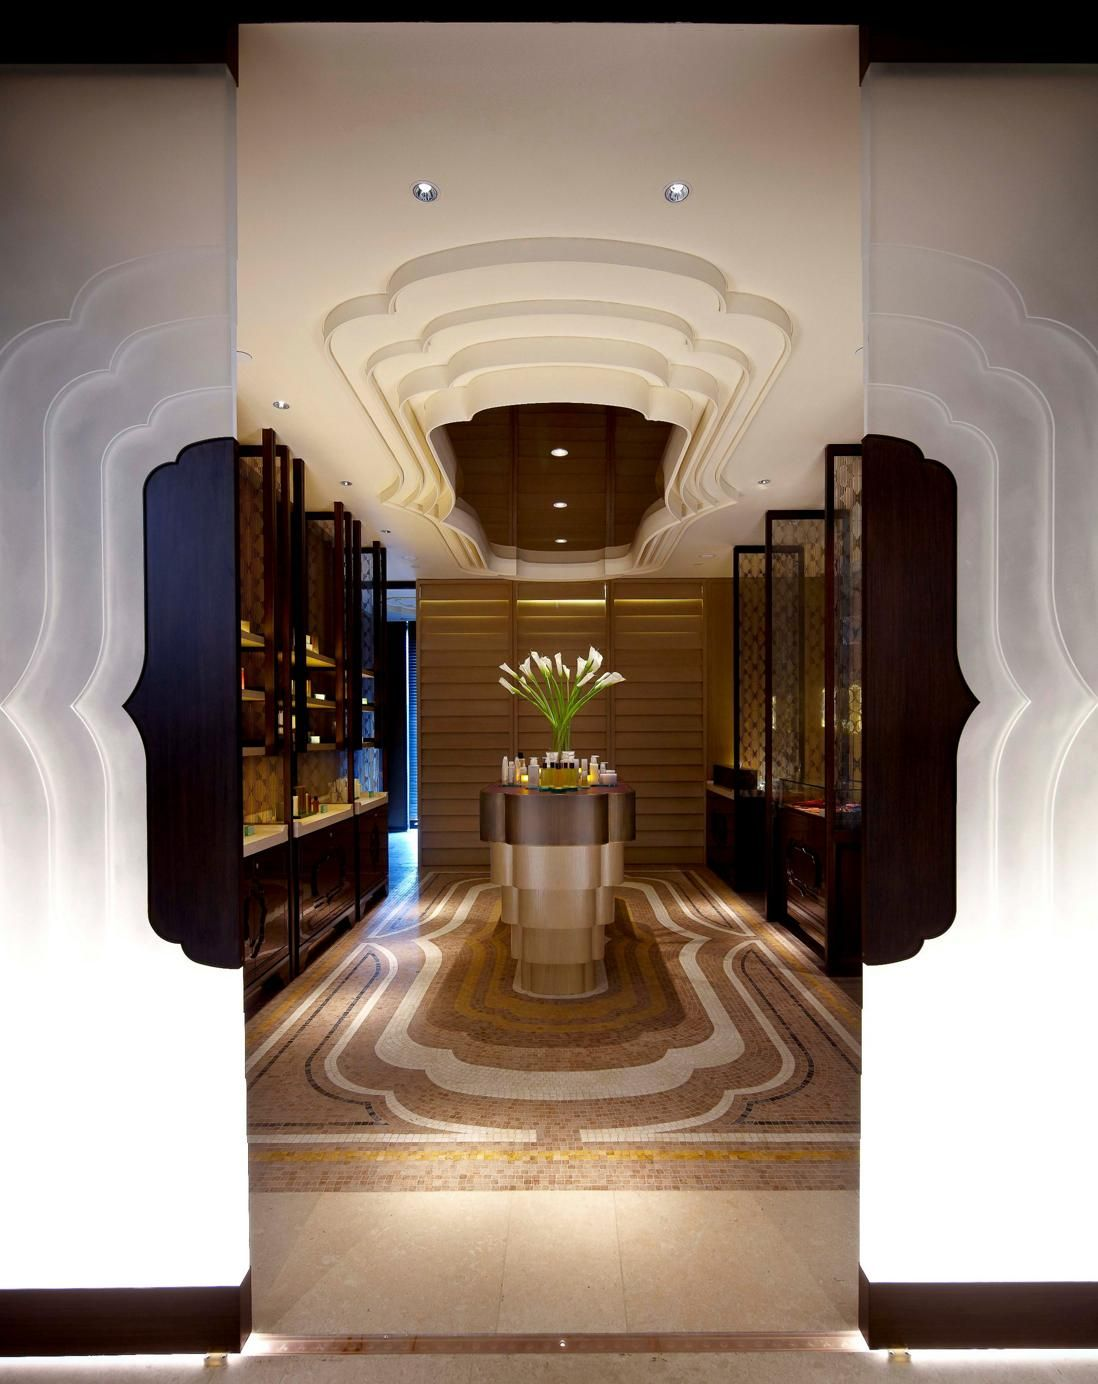 Photo Video Gallery Marina Bay Hotel Mandarin Oriental Singapore Luxury Rooms Hotel Mandarin Oriental